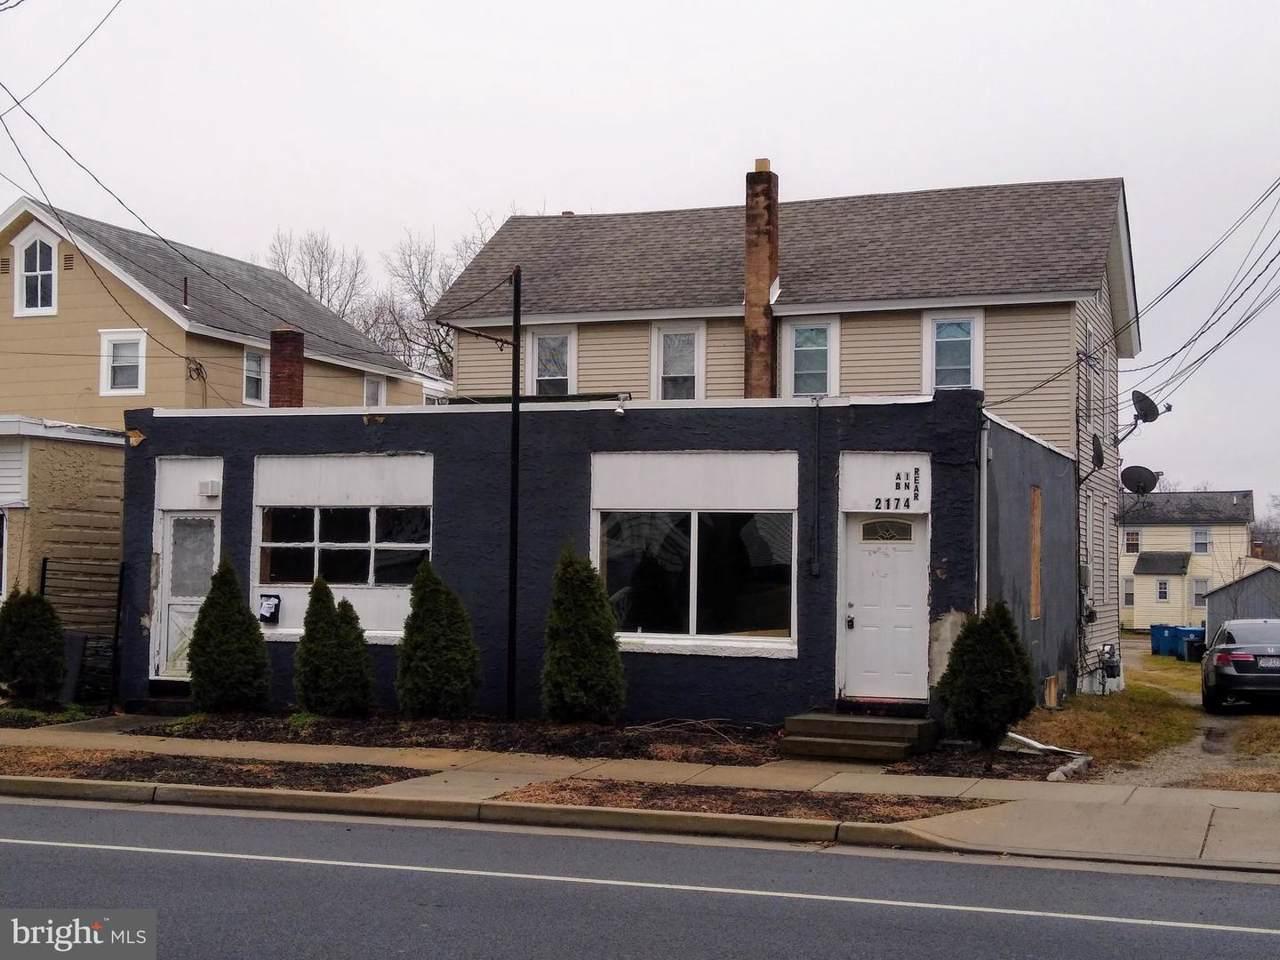 2174 Atco Avenue - Photo 1